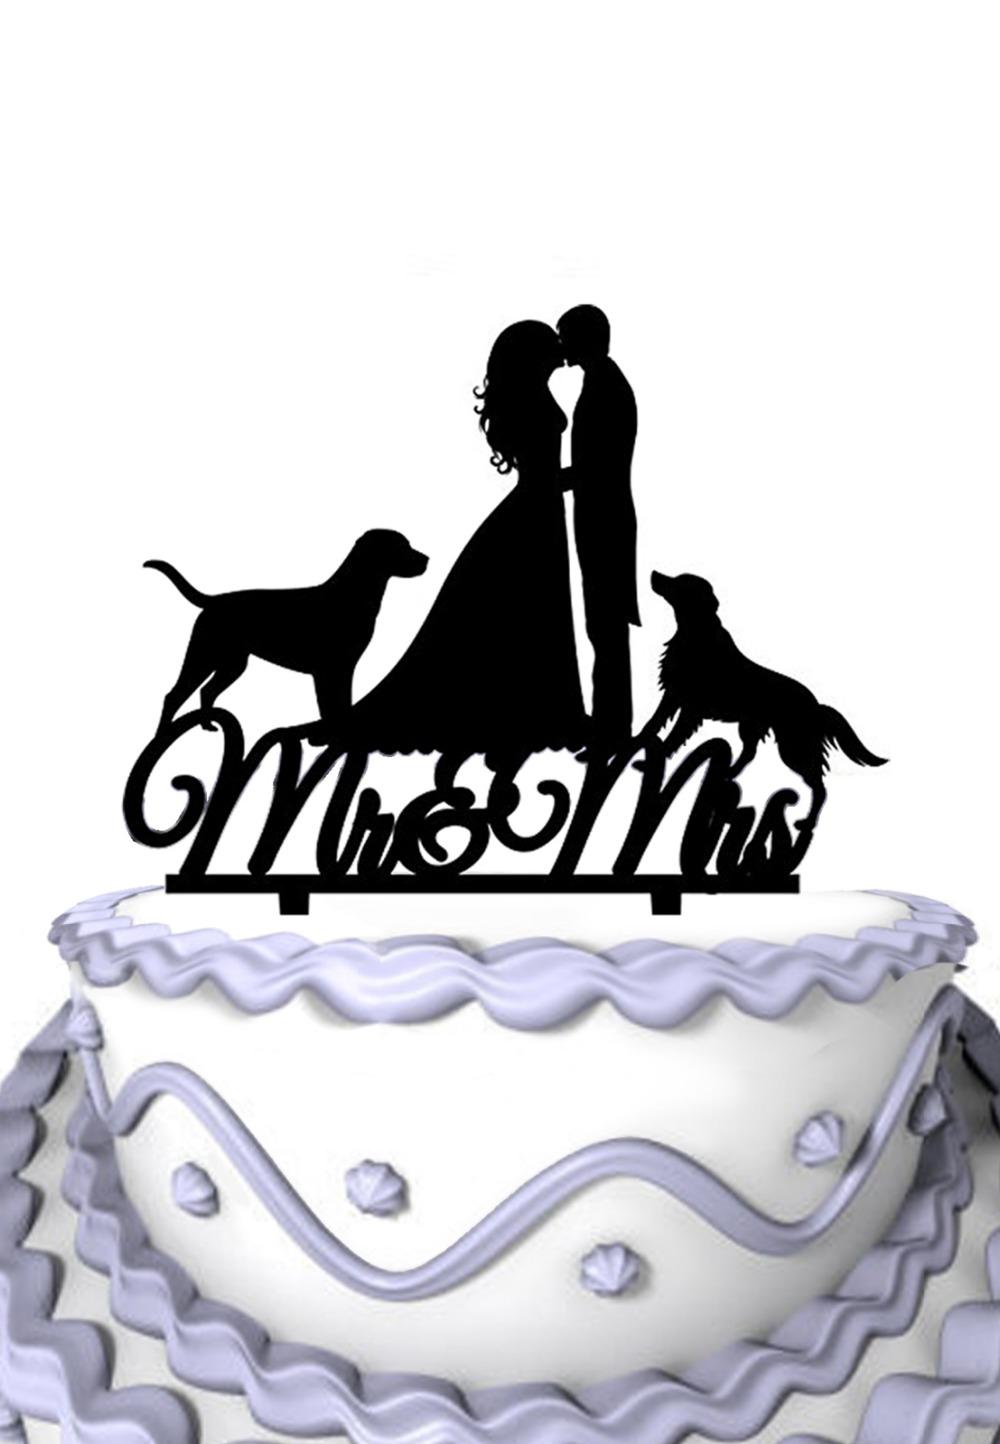 Mr Mrs Wedding Cake Topper- Wedding Cake Decoration- Sihouette Cake Toppers- Wedding Cake Topper Dog(China (Mainland))